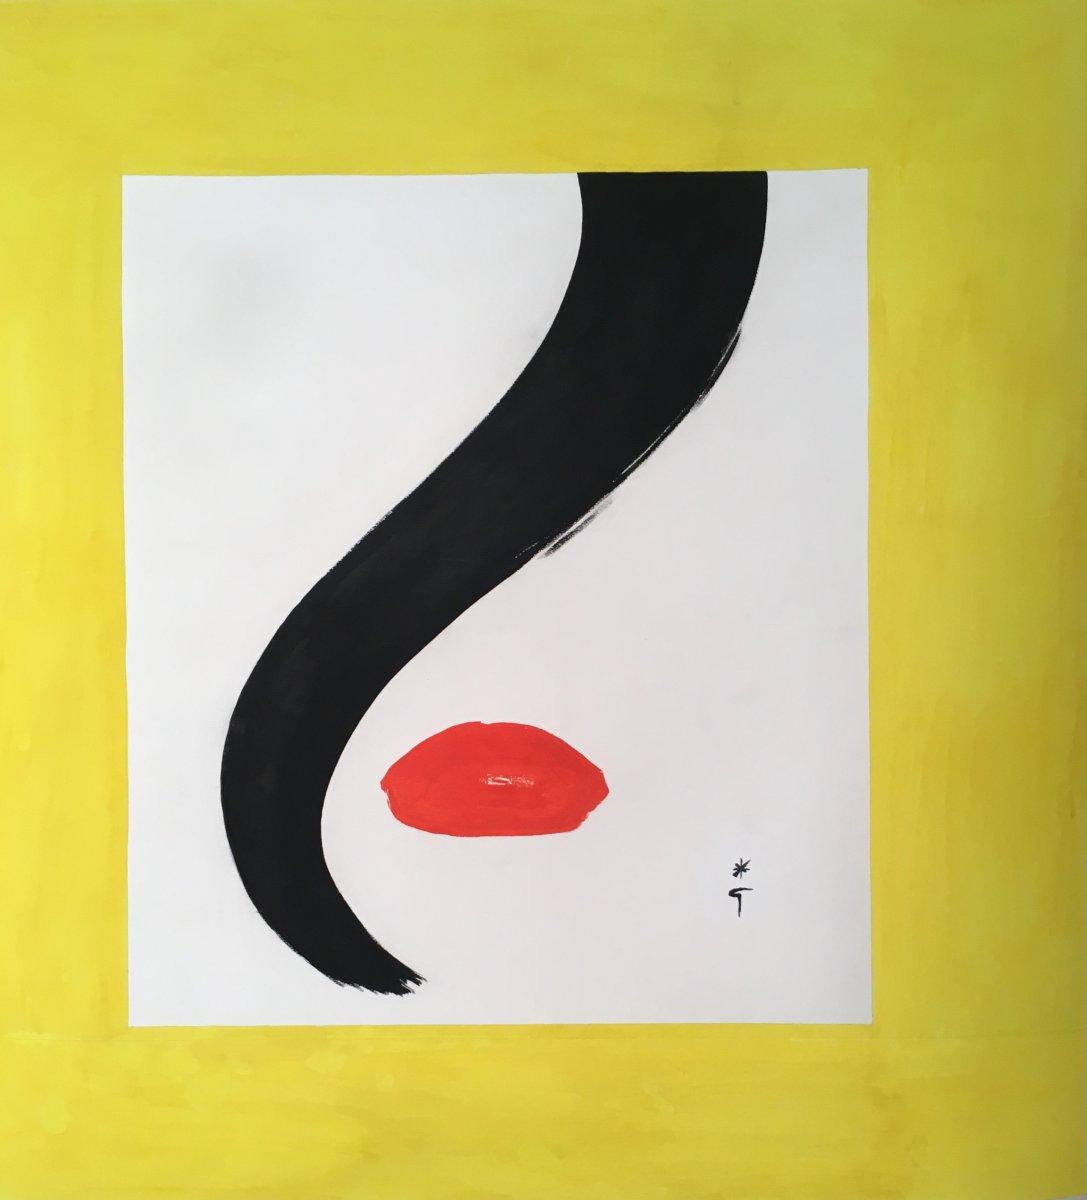 Gouache Signed Bottom Right, 1989, 83.5 X 83.5 Cm, Canvas.